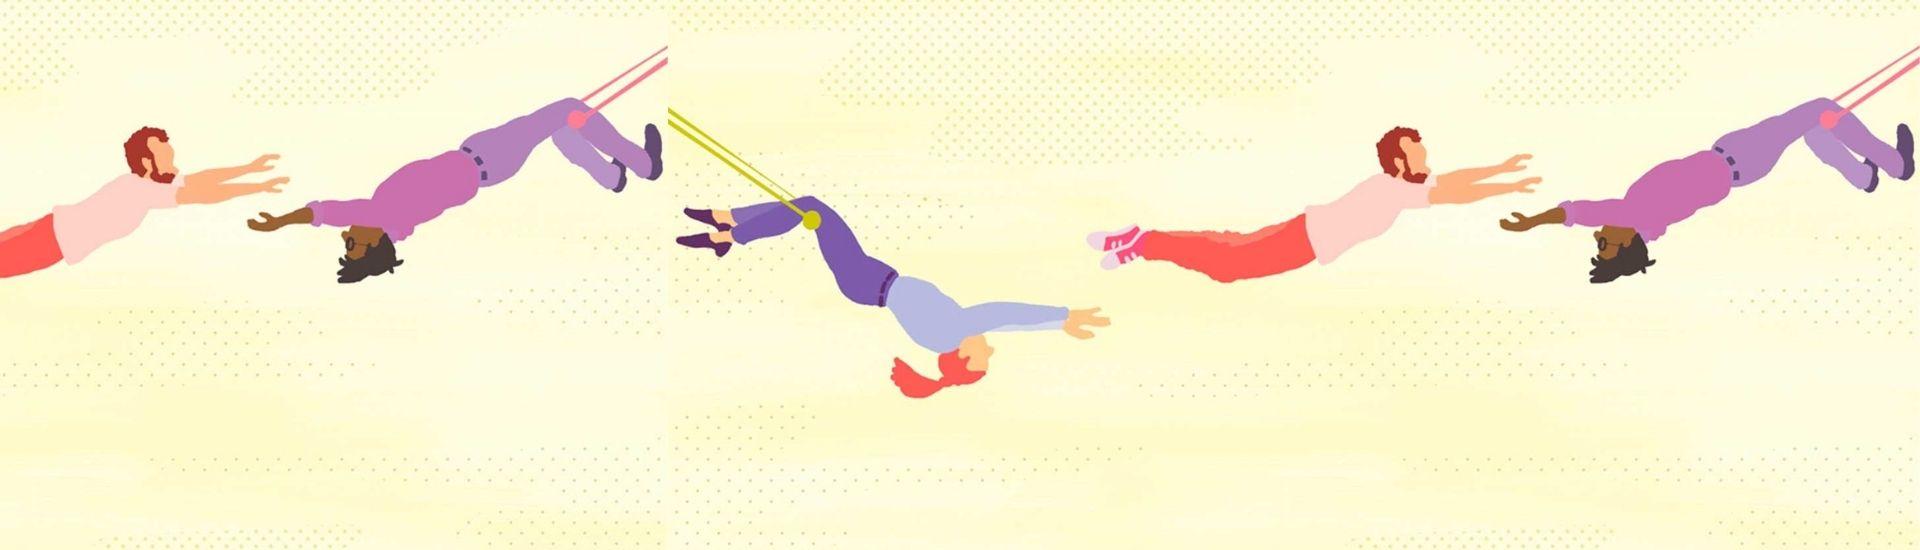 Ilustración de acrobacia